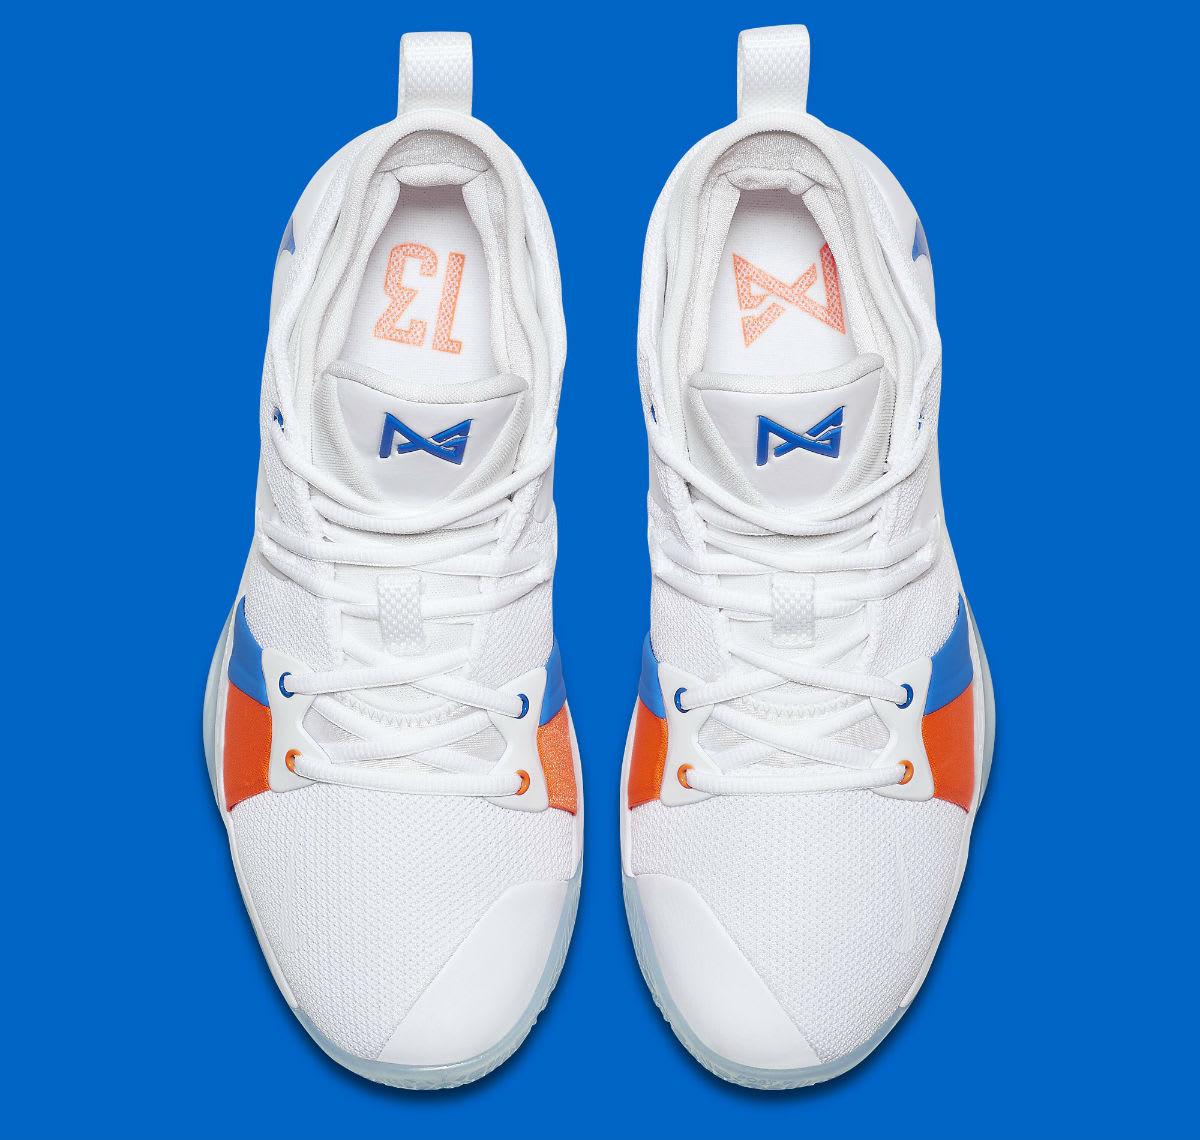 0502589d7d1 Nike PG2 OKC Home Release Date AJ2039-100 Main - Premier Kicks